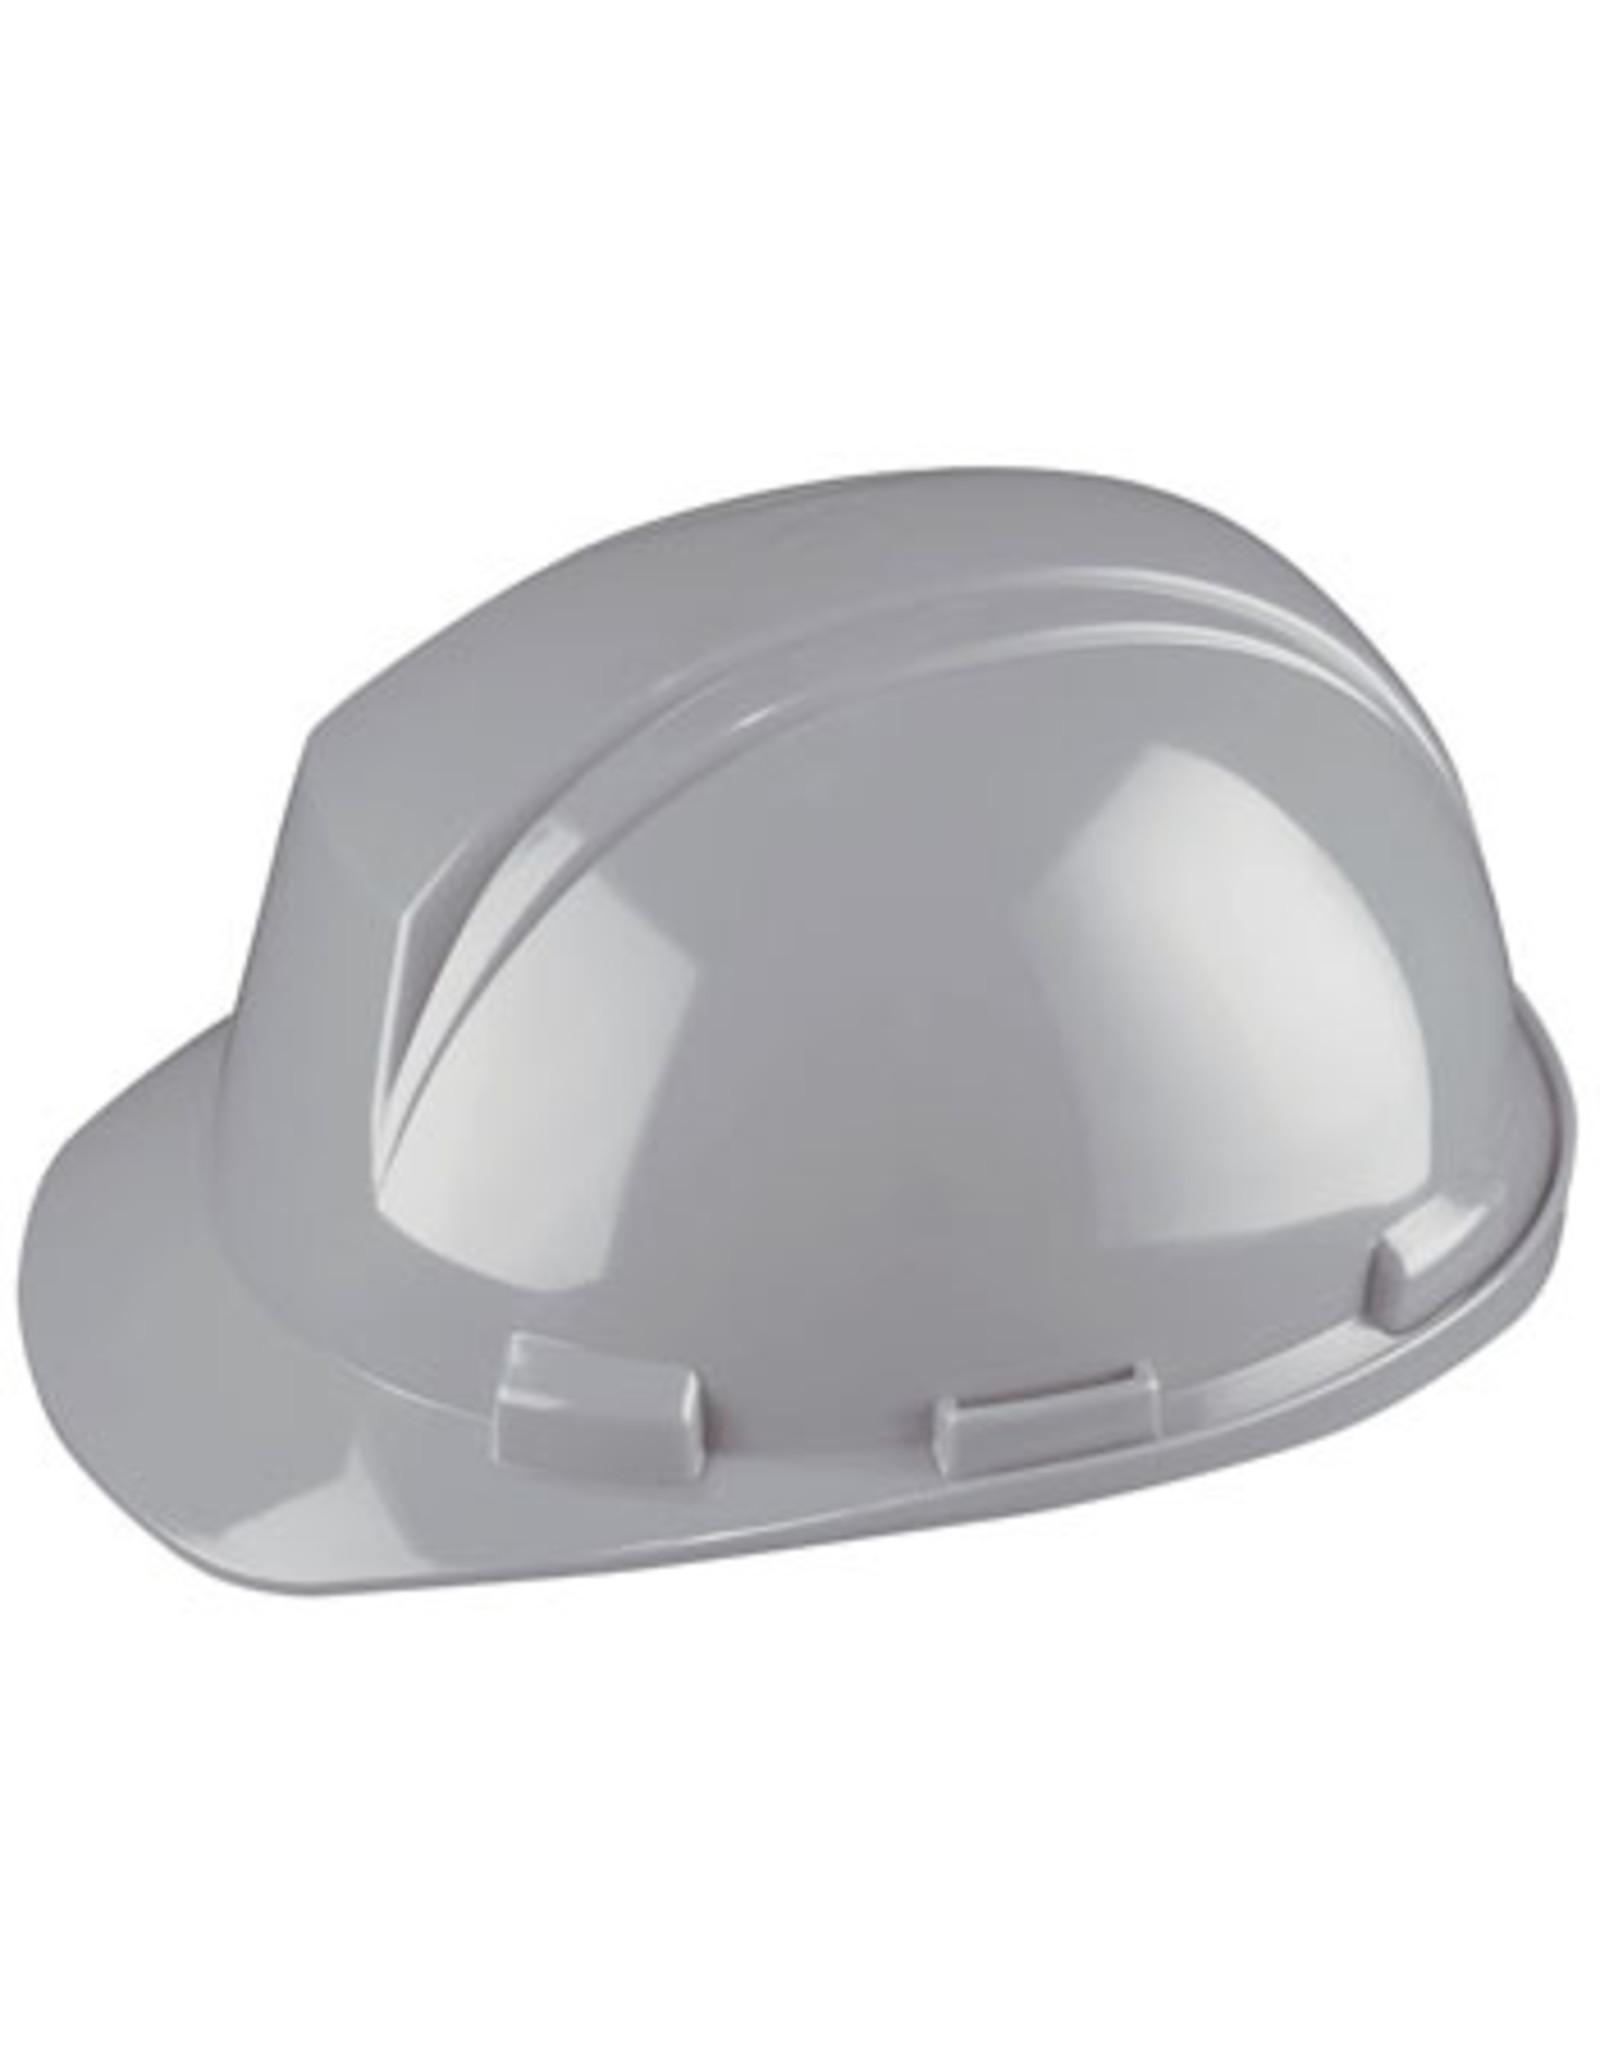 MONT-BLANC SAFETY HAT TYPE 2 - ''SURE-LOCK'' RATCHET